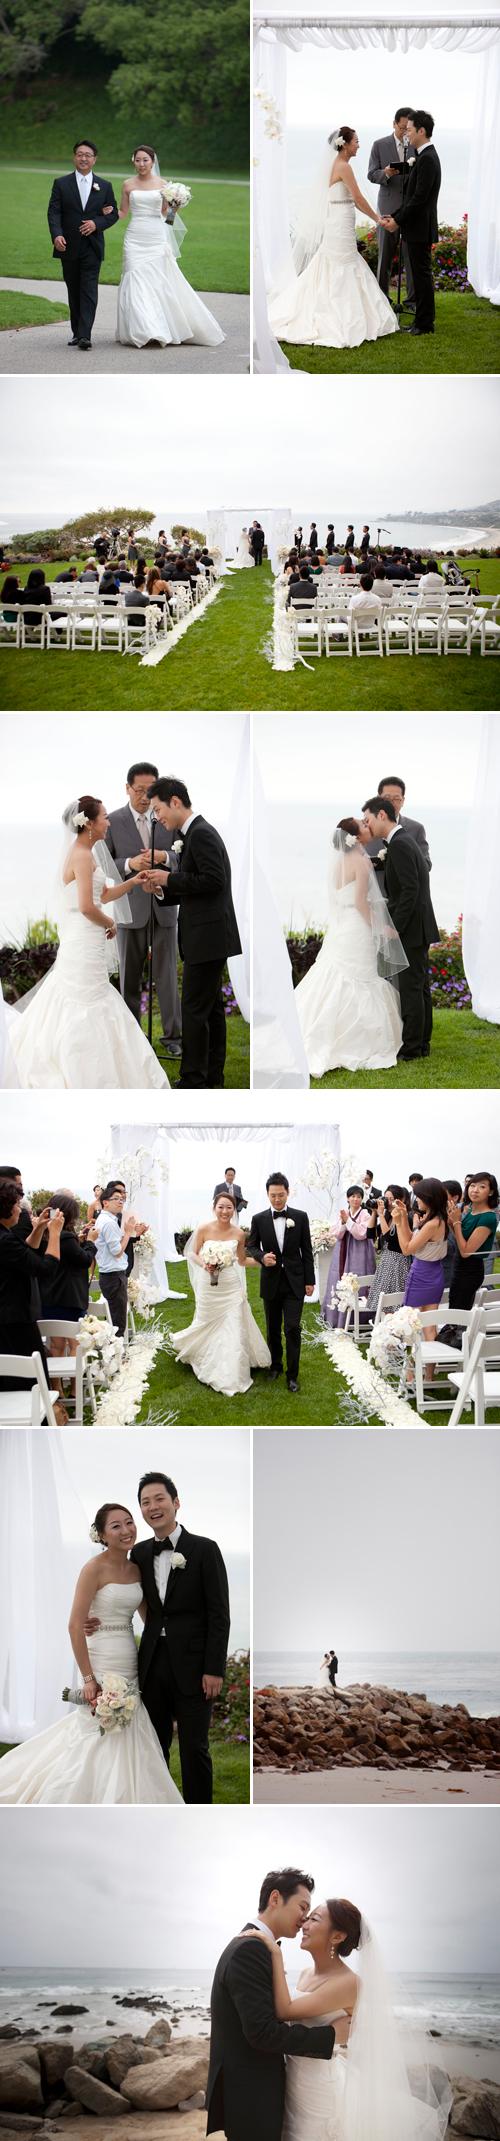 Wedding at The Ritz-Carlton Laguna Niguel | Junebug Weddings